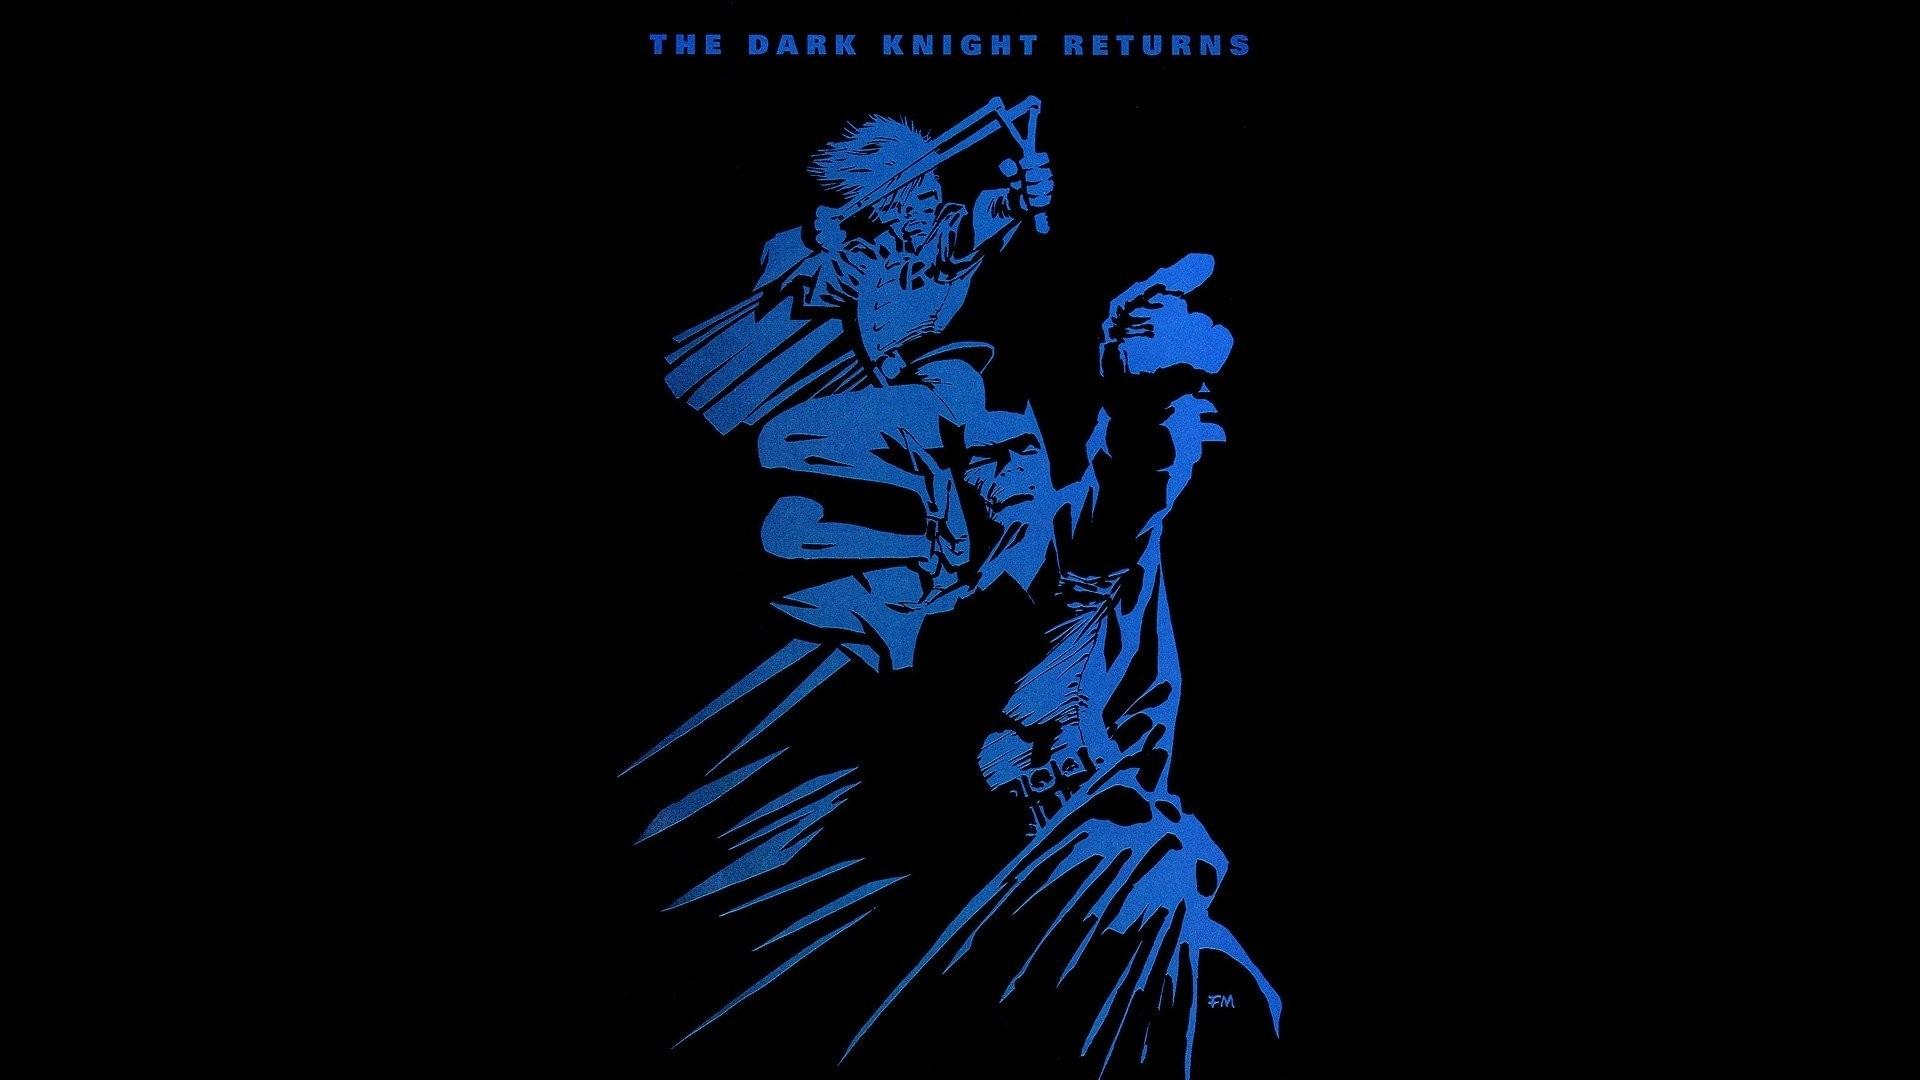 batman dark knight returns wallpaper (78+ images)